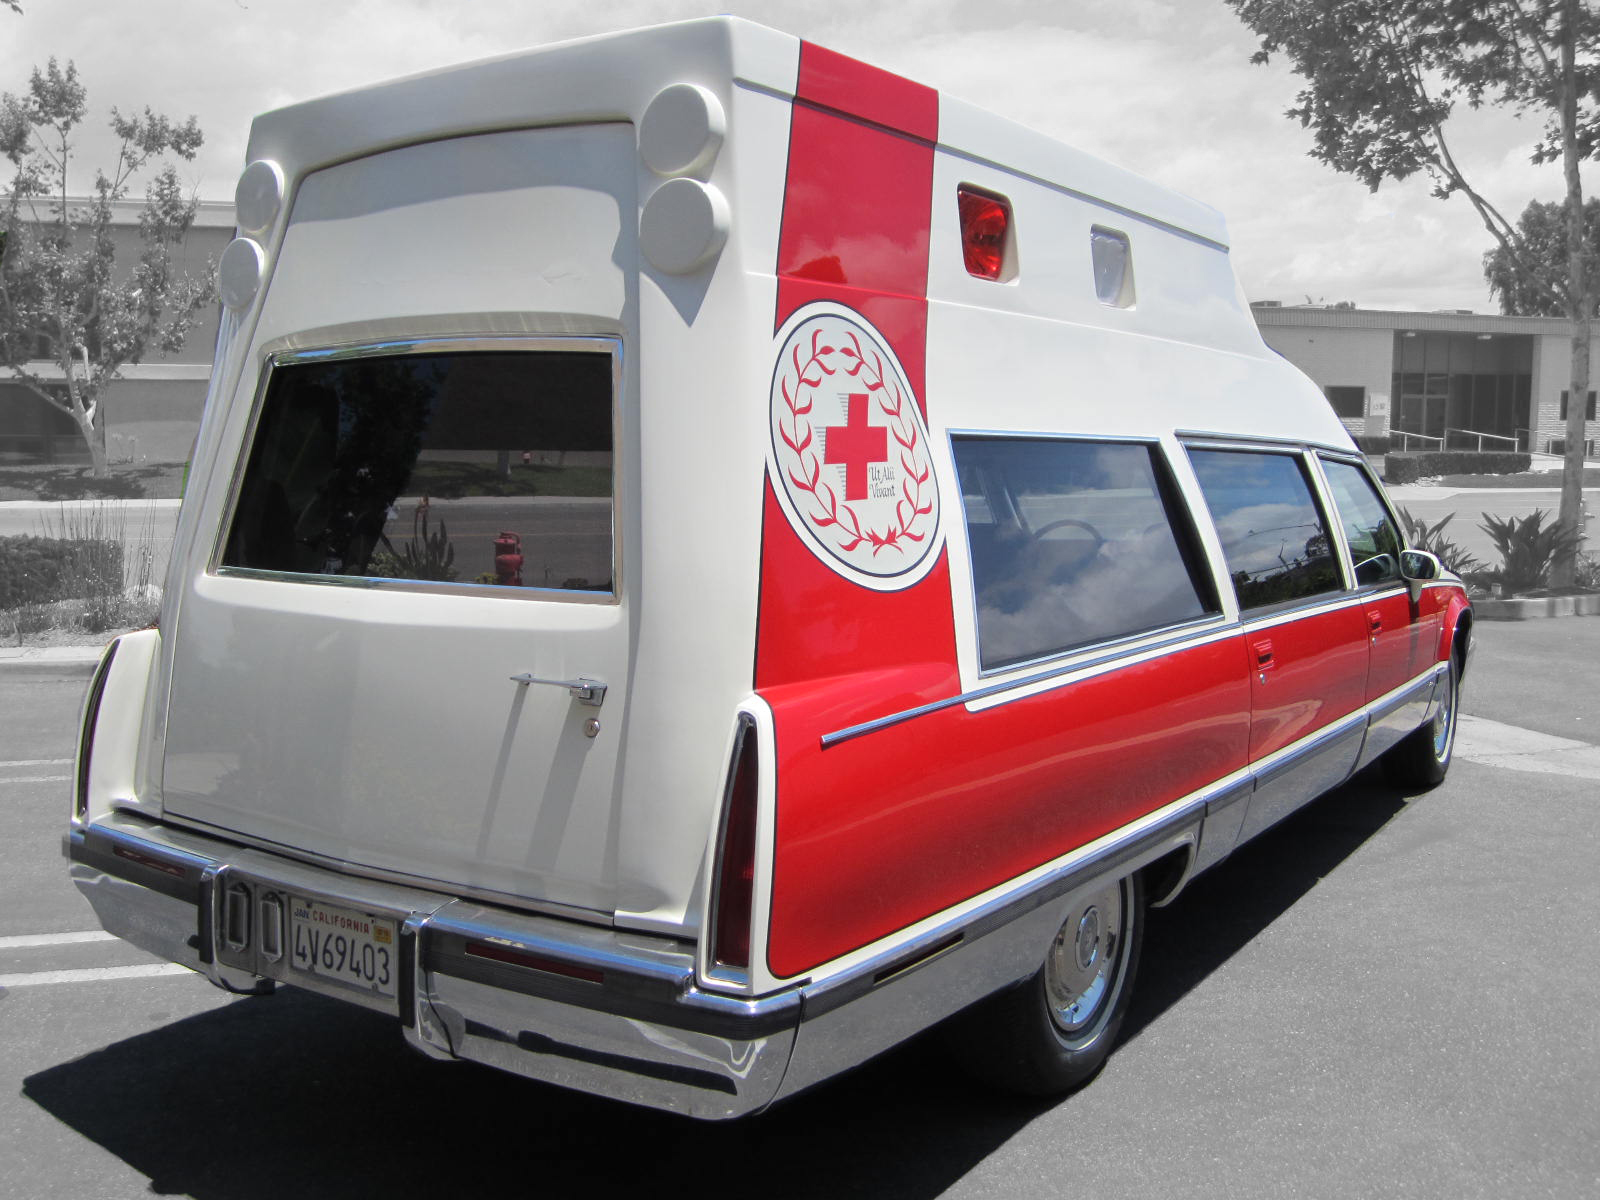 1993 Cadiilac Fleetwood Ambulance For Sale 002